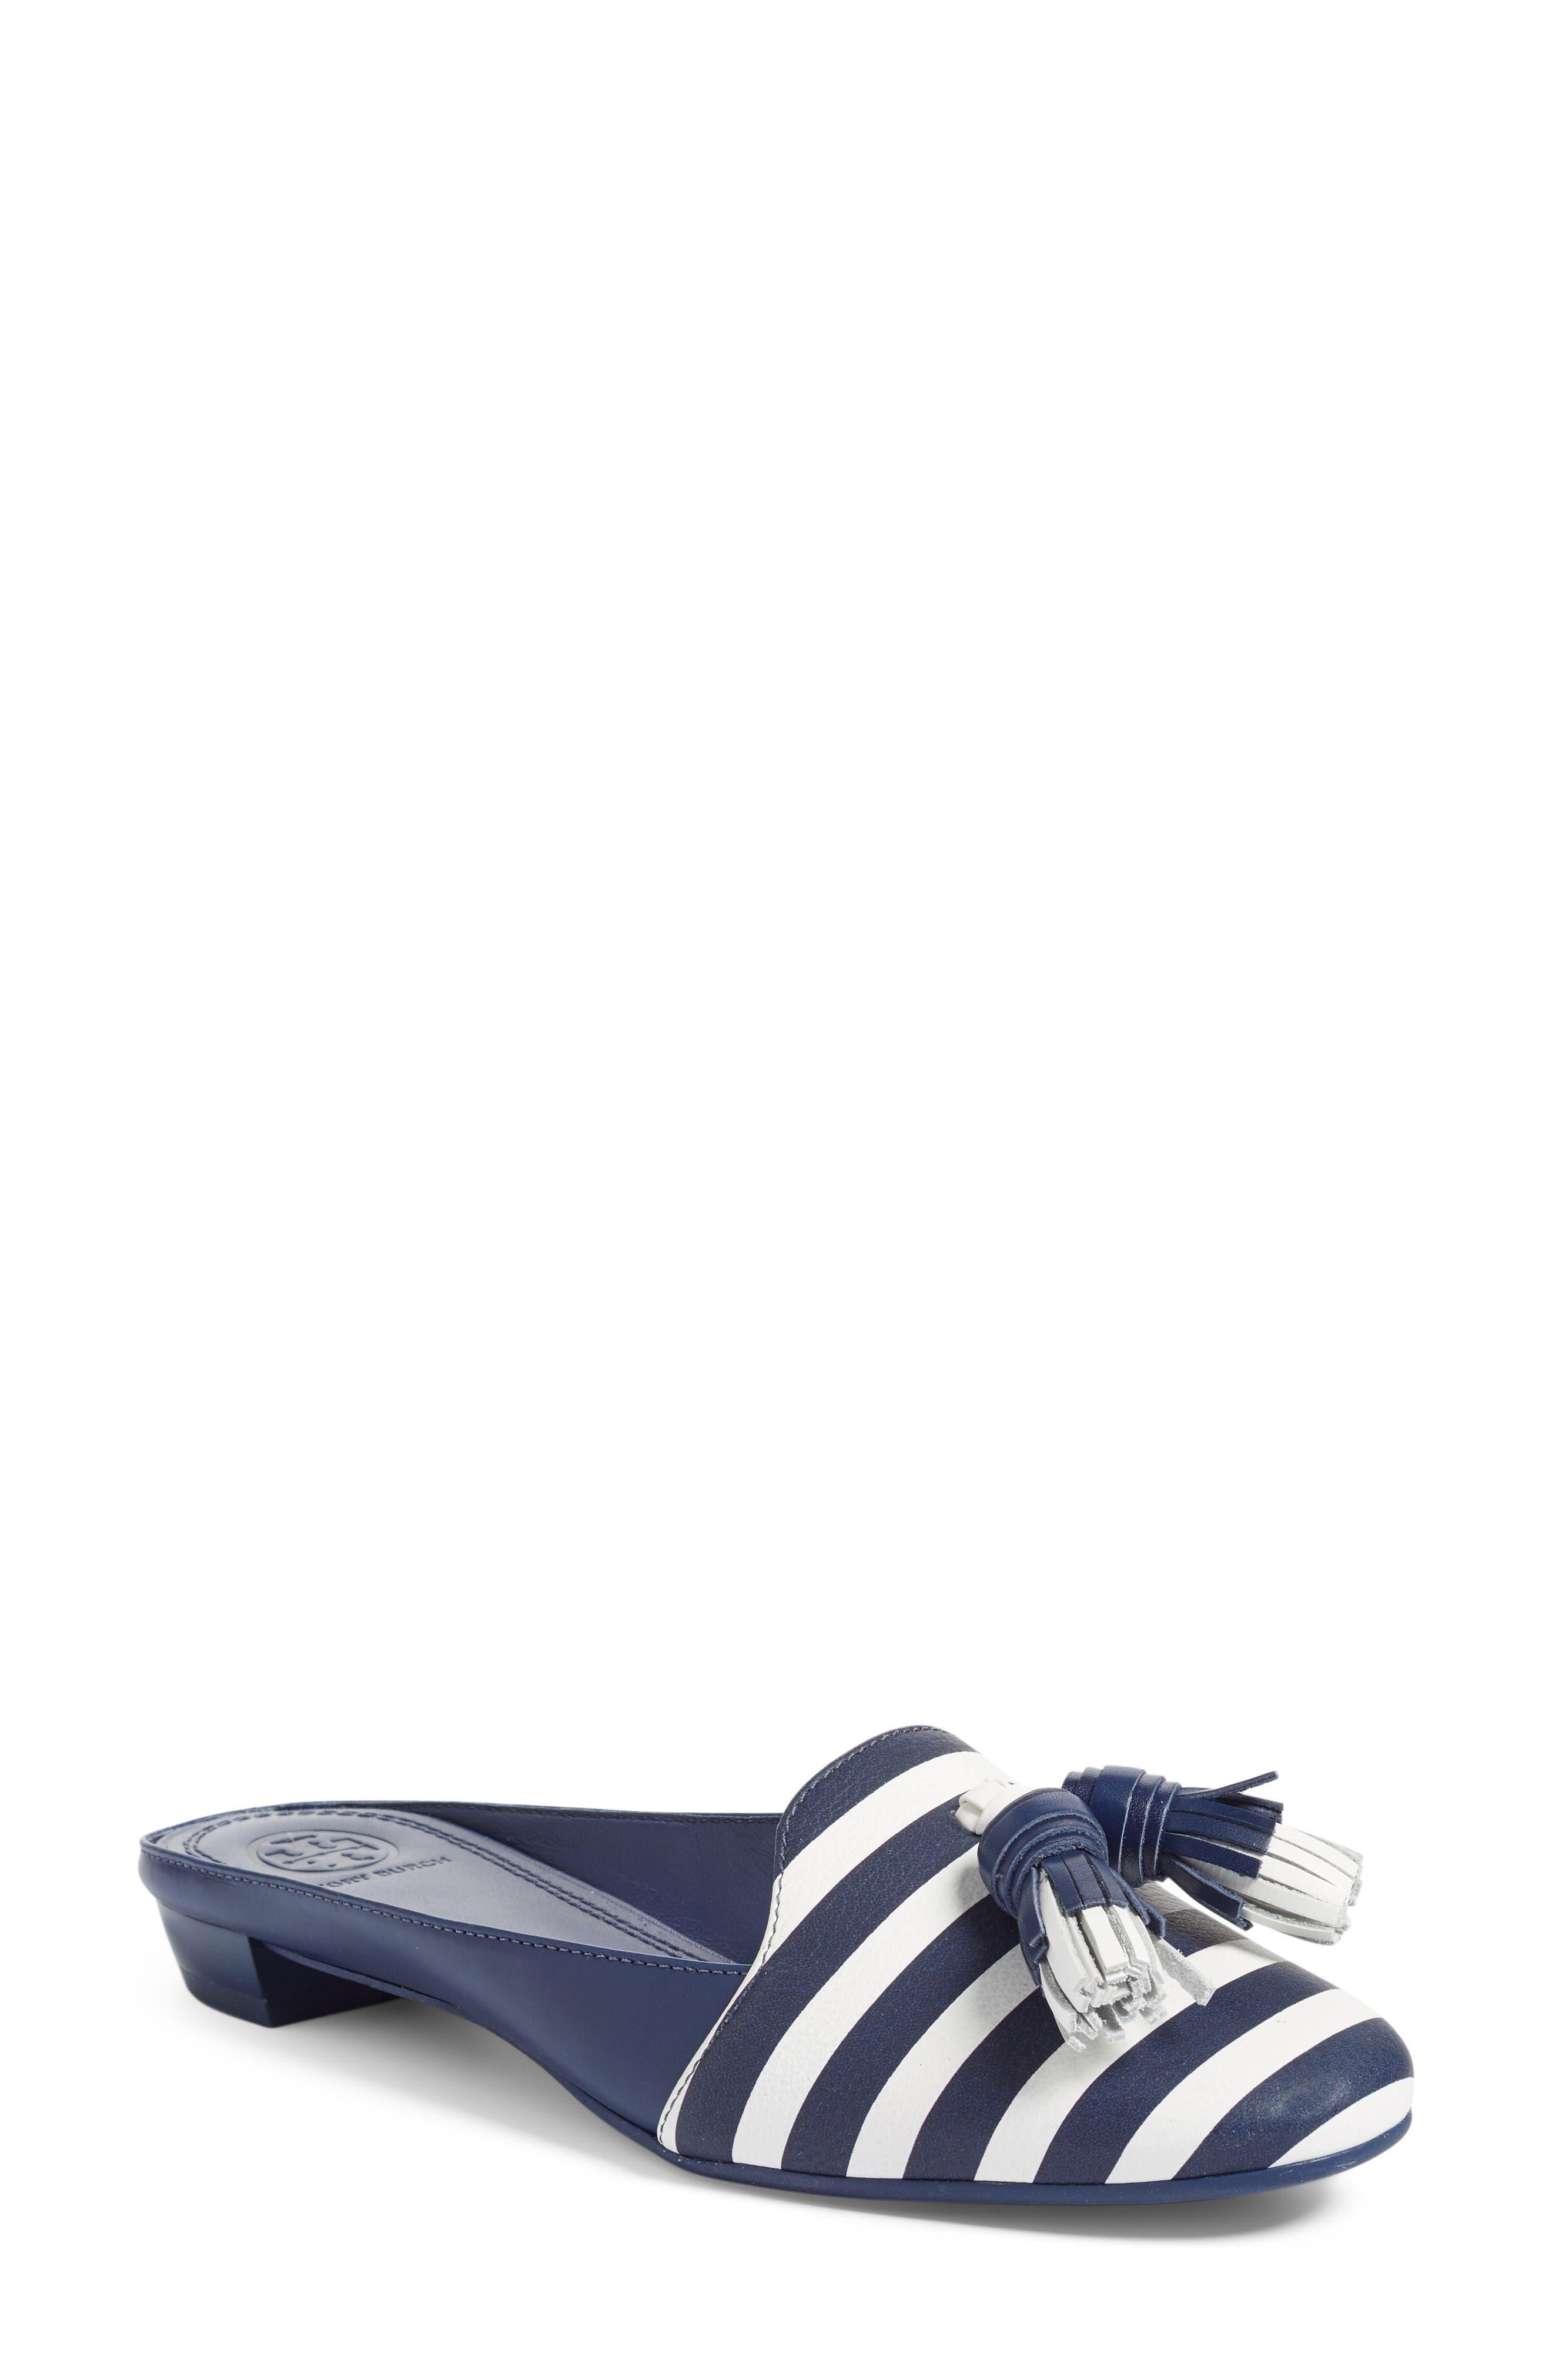 Maritime Tassel Mule Loafer,                             Main thumbnail 1, color,                             Navy Sea / White